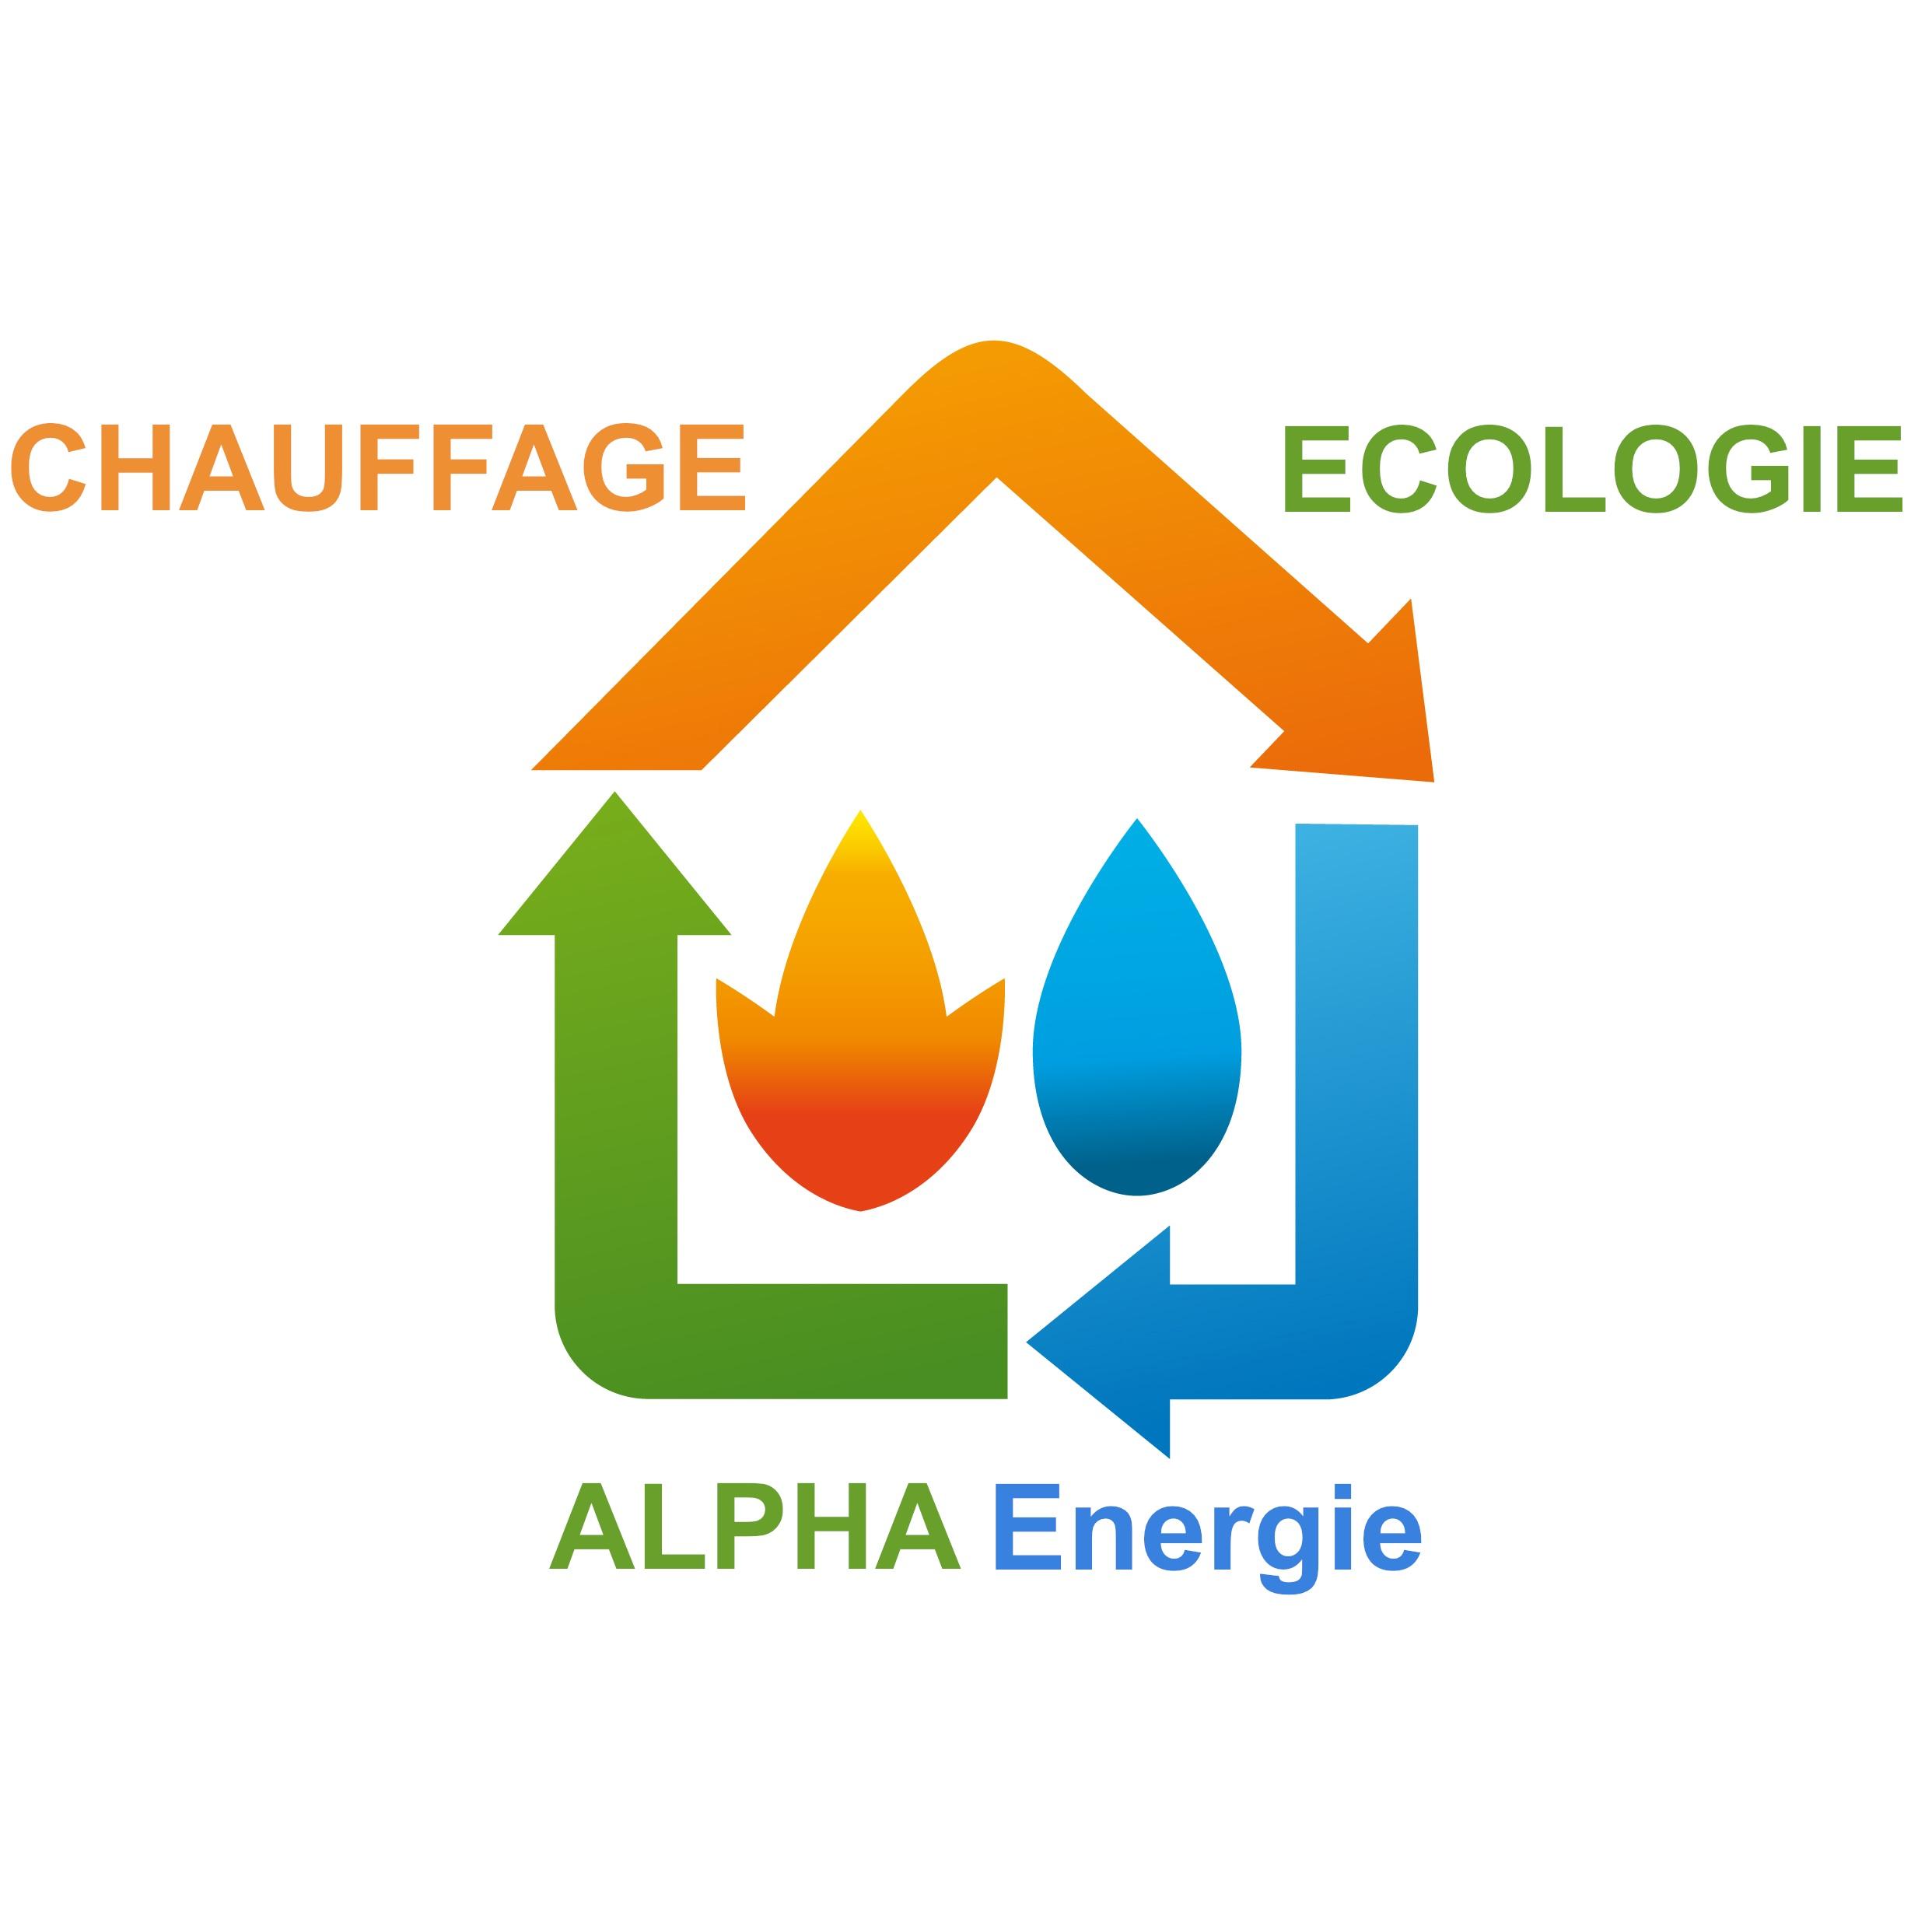 chauffage ecologie alpha energie. Black Bedroom Furniture Sets. Home Design Ideas